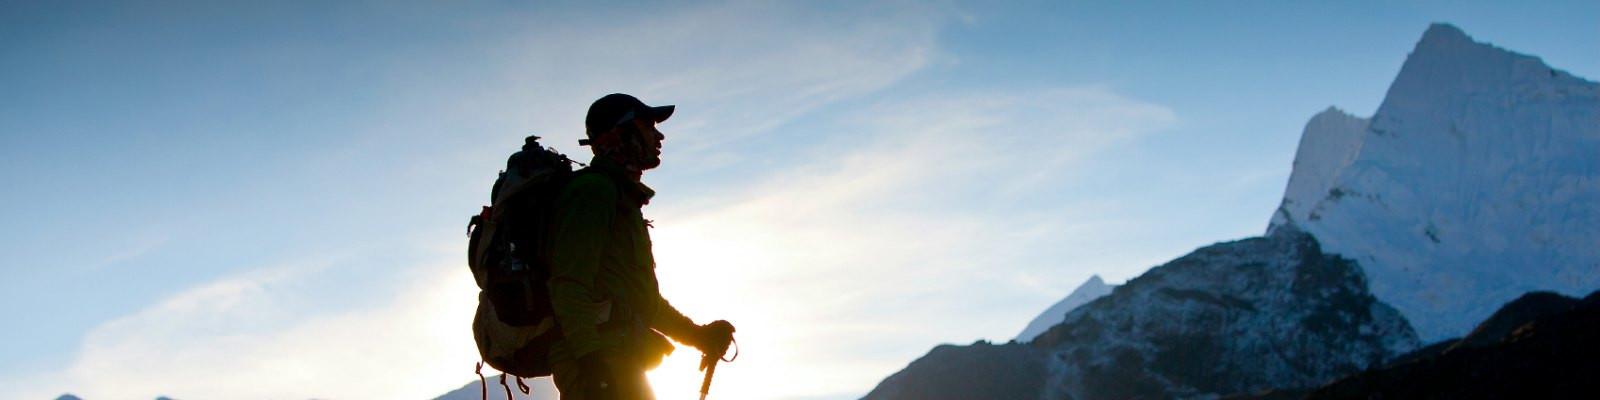 Trekking Reisen